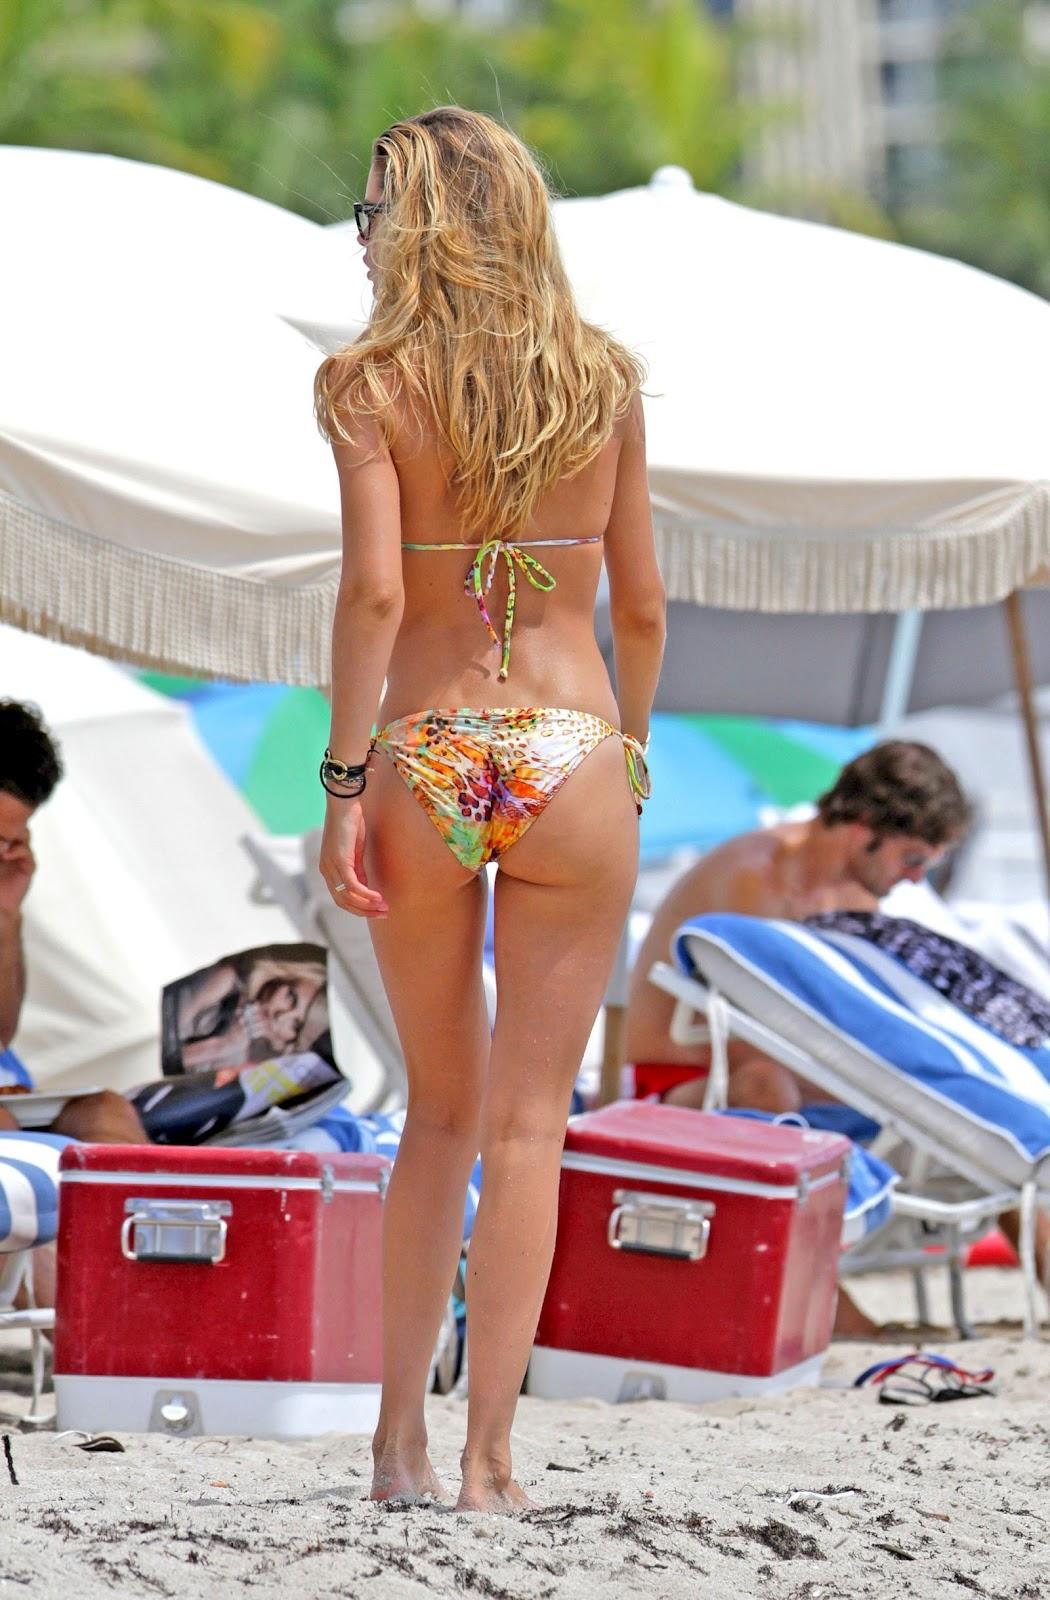 http://2.bp.blogspot.com/-17HUeKTMuKo/UDubDjzgYFI/AAAAAAAAbtk/LKl4iHcRomU/s1600/Doutzen+Kroes+Bikini+Candids+in+Miami+-+August+18,+2012+02.jpg